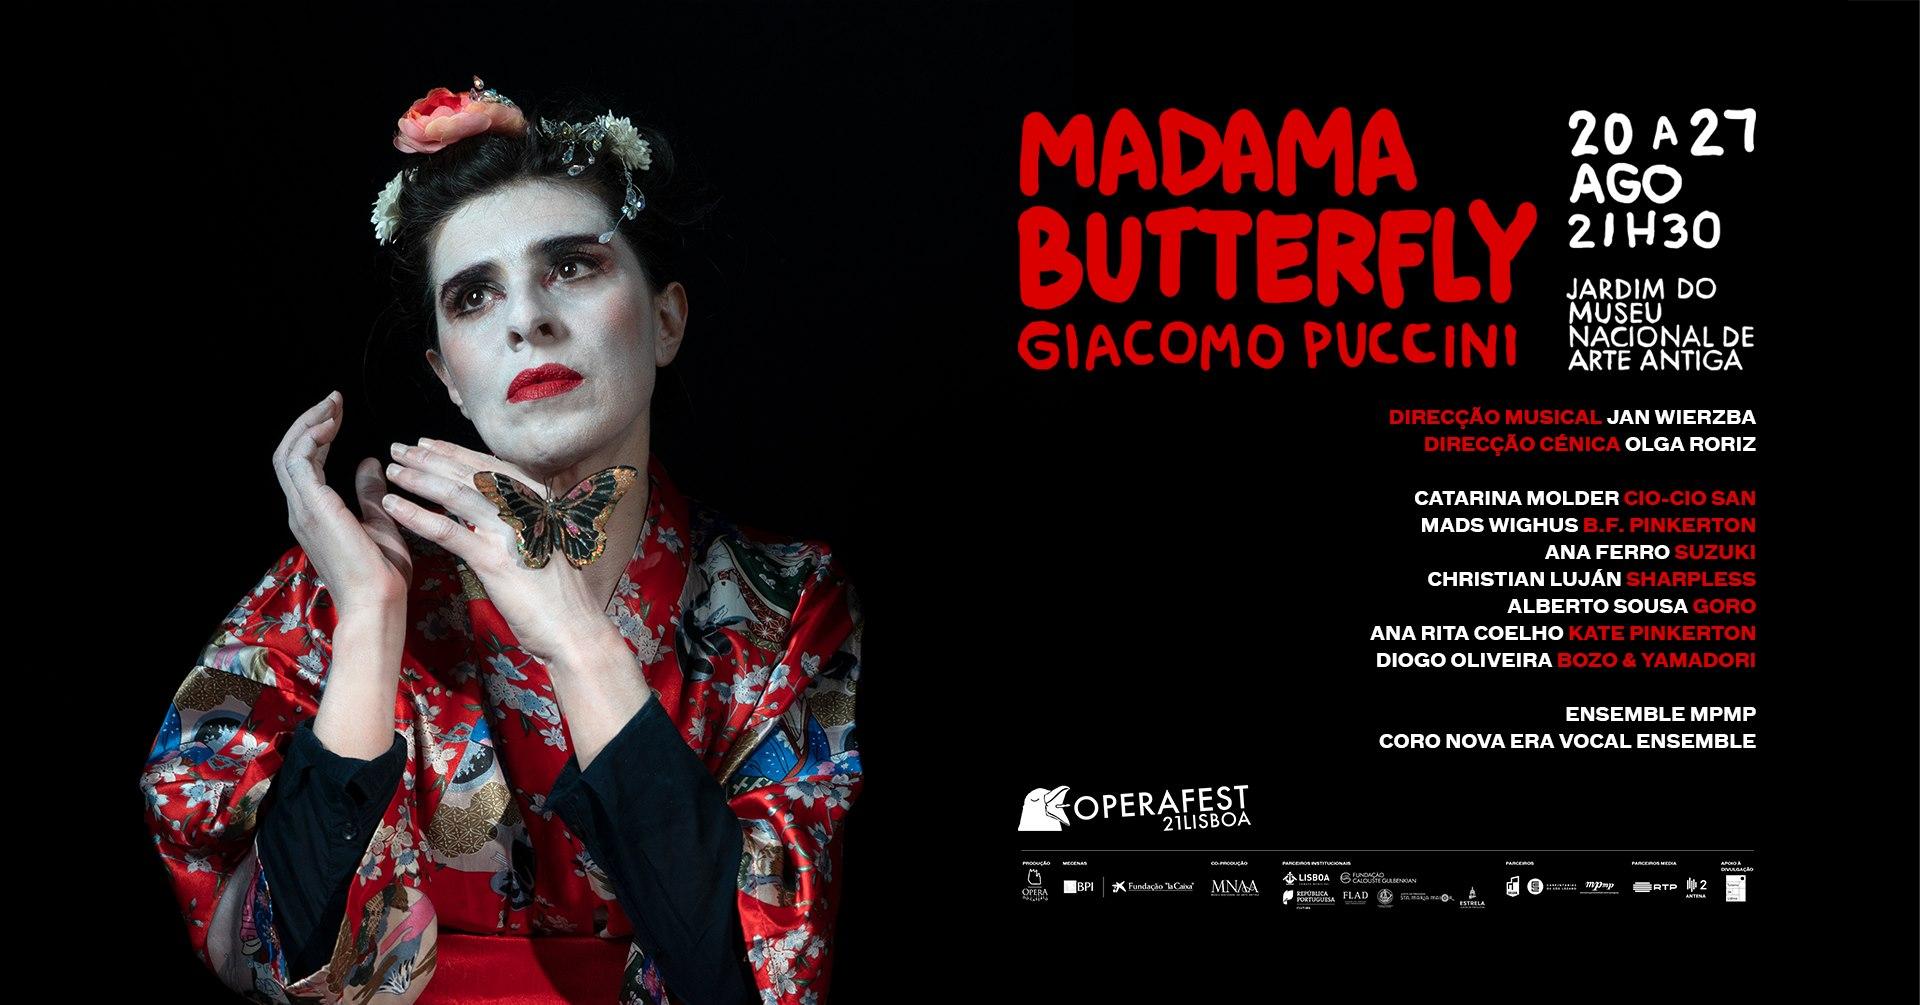 Madama Butterfly - OPERAFEST LISBOA 2021